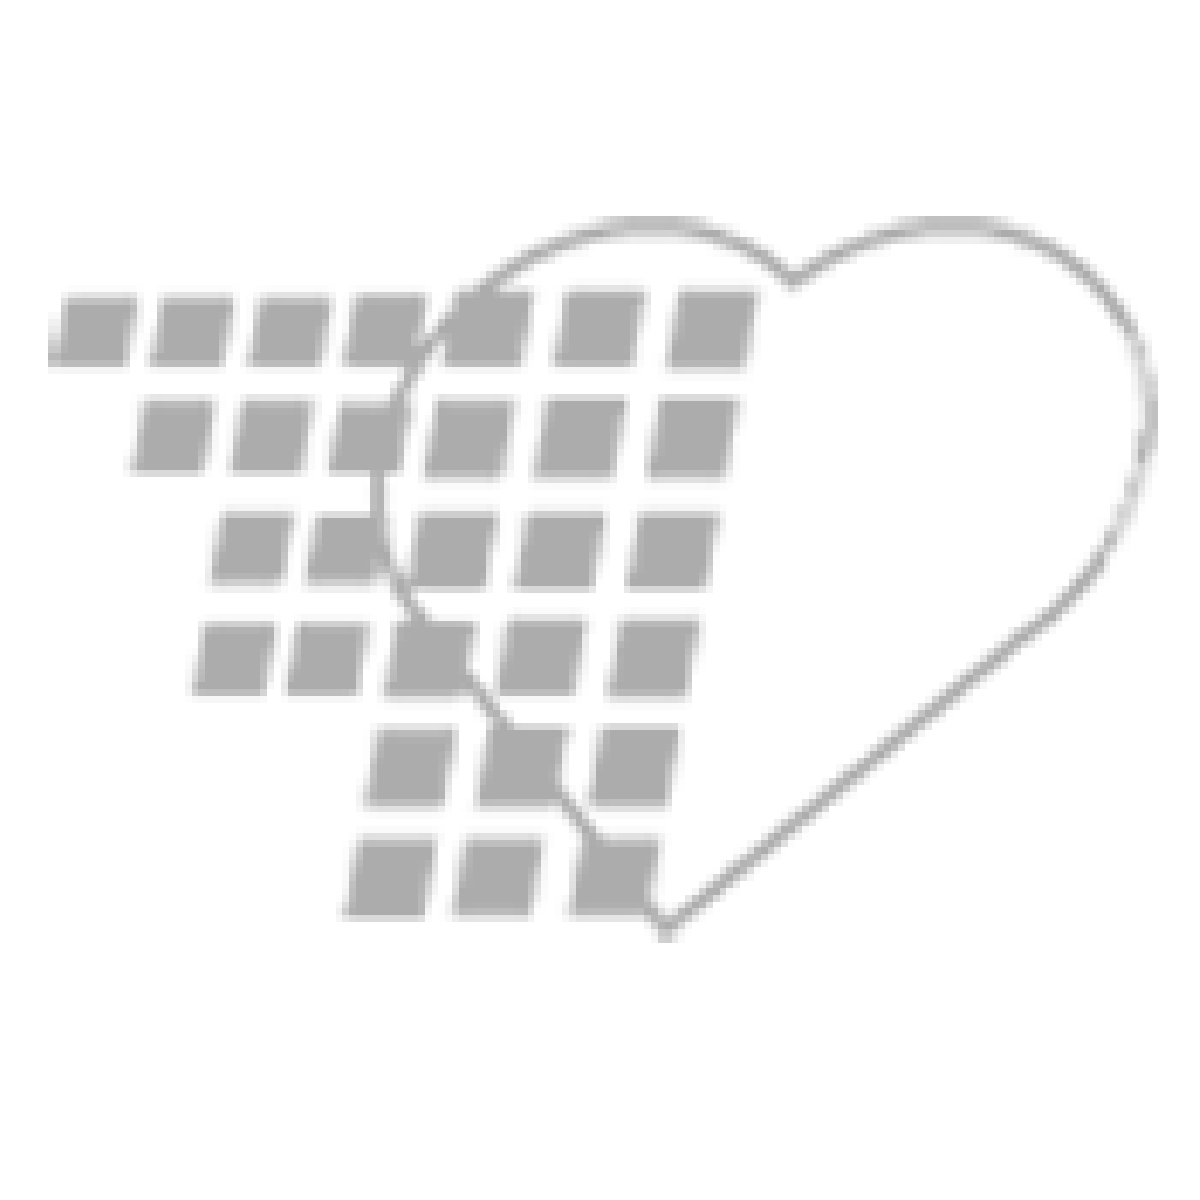 02-70-7100 Welch Allyn  Handle for Halogen Instruments (3.5V)